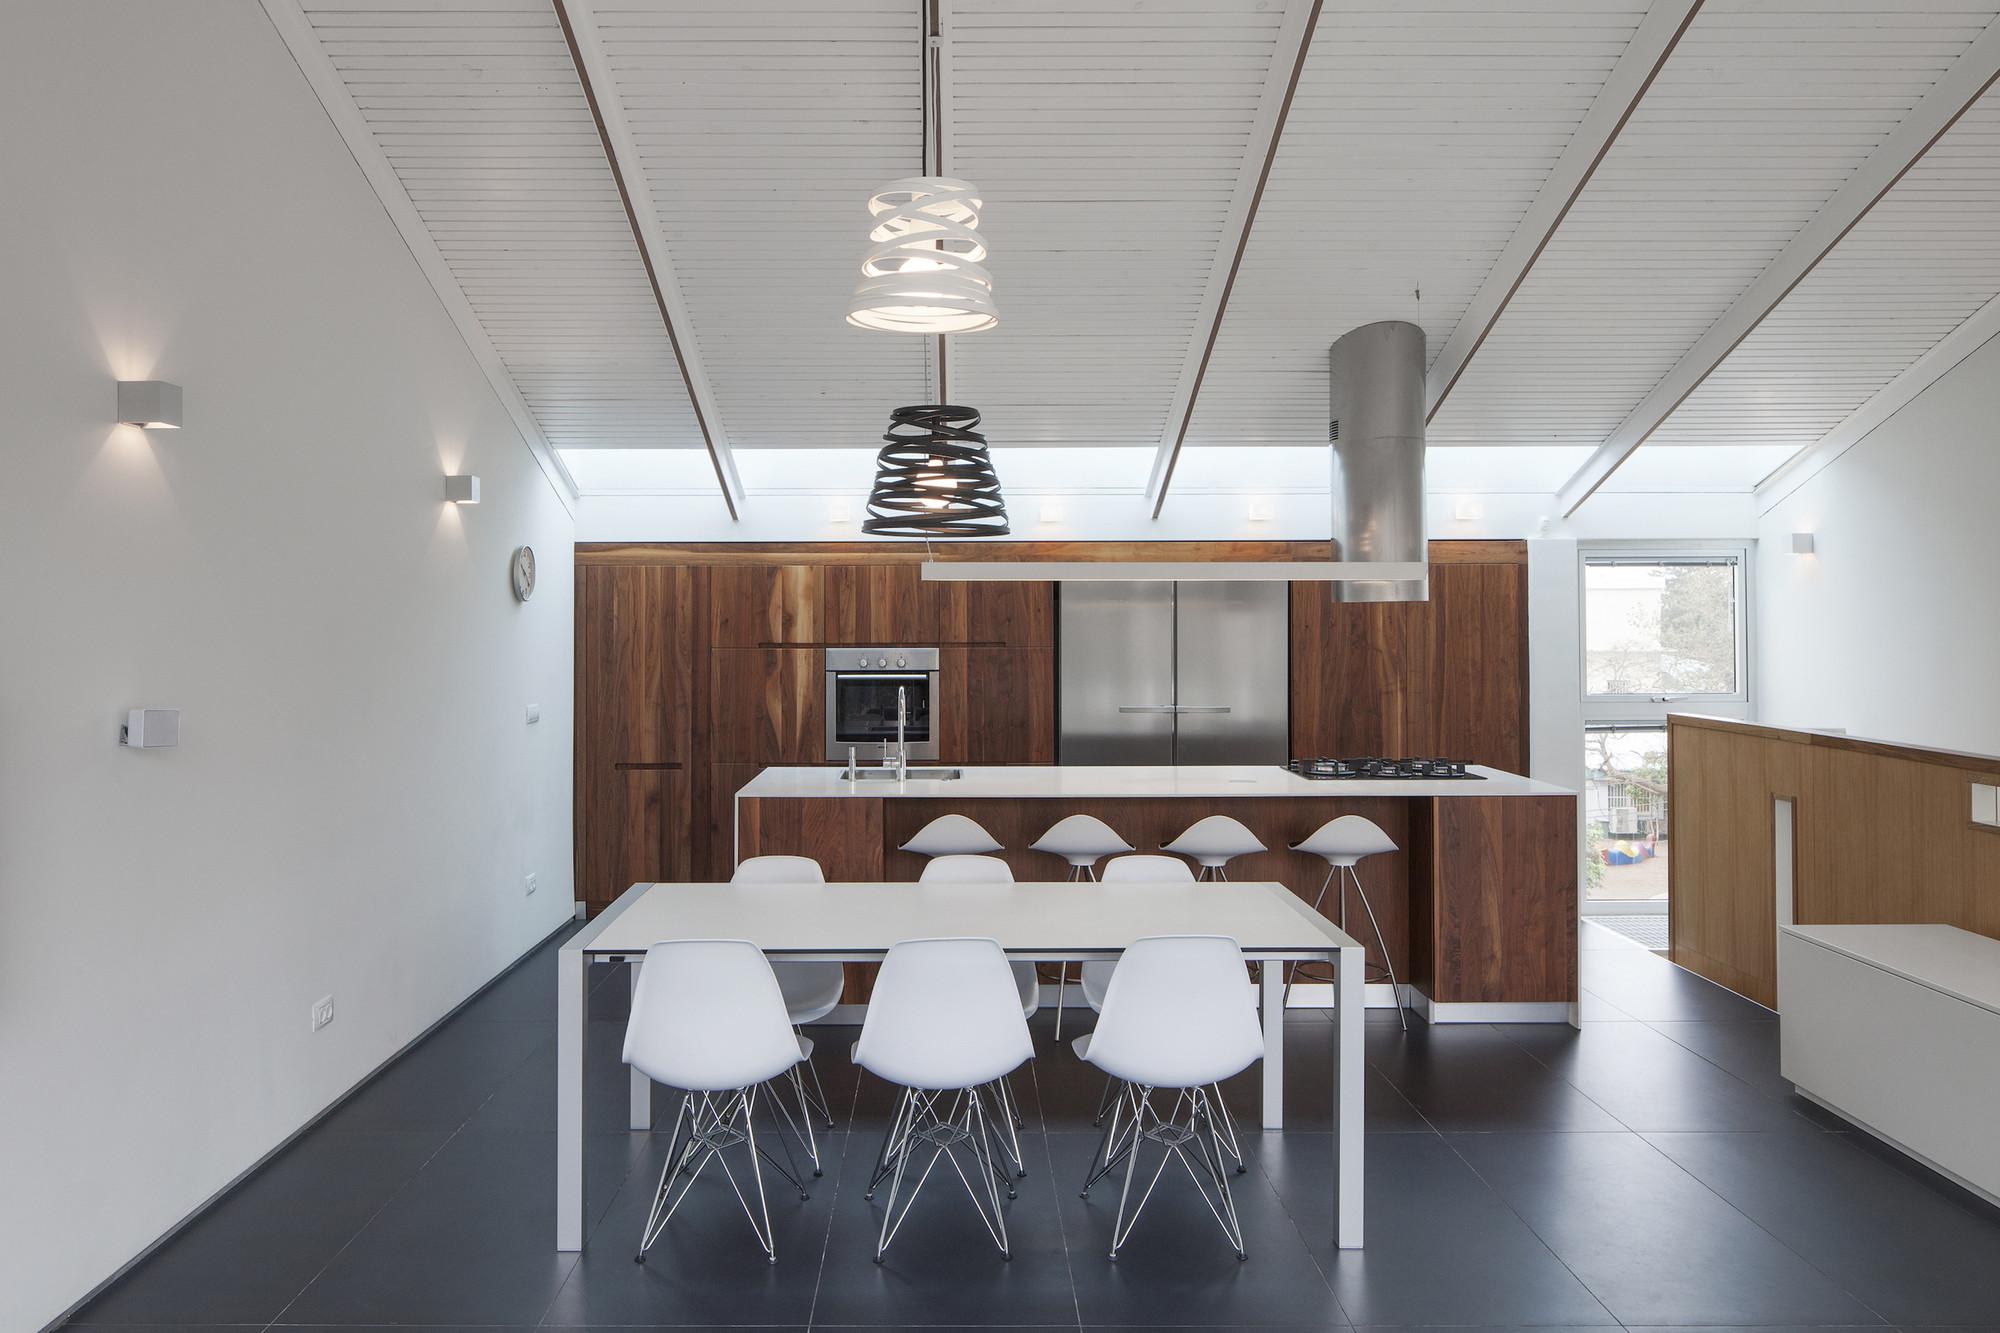 K-house / Arbejazz Architecture Studio, © Aviad Bar Ness